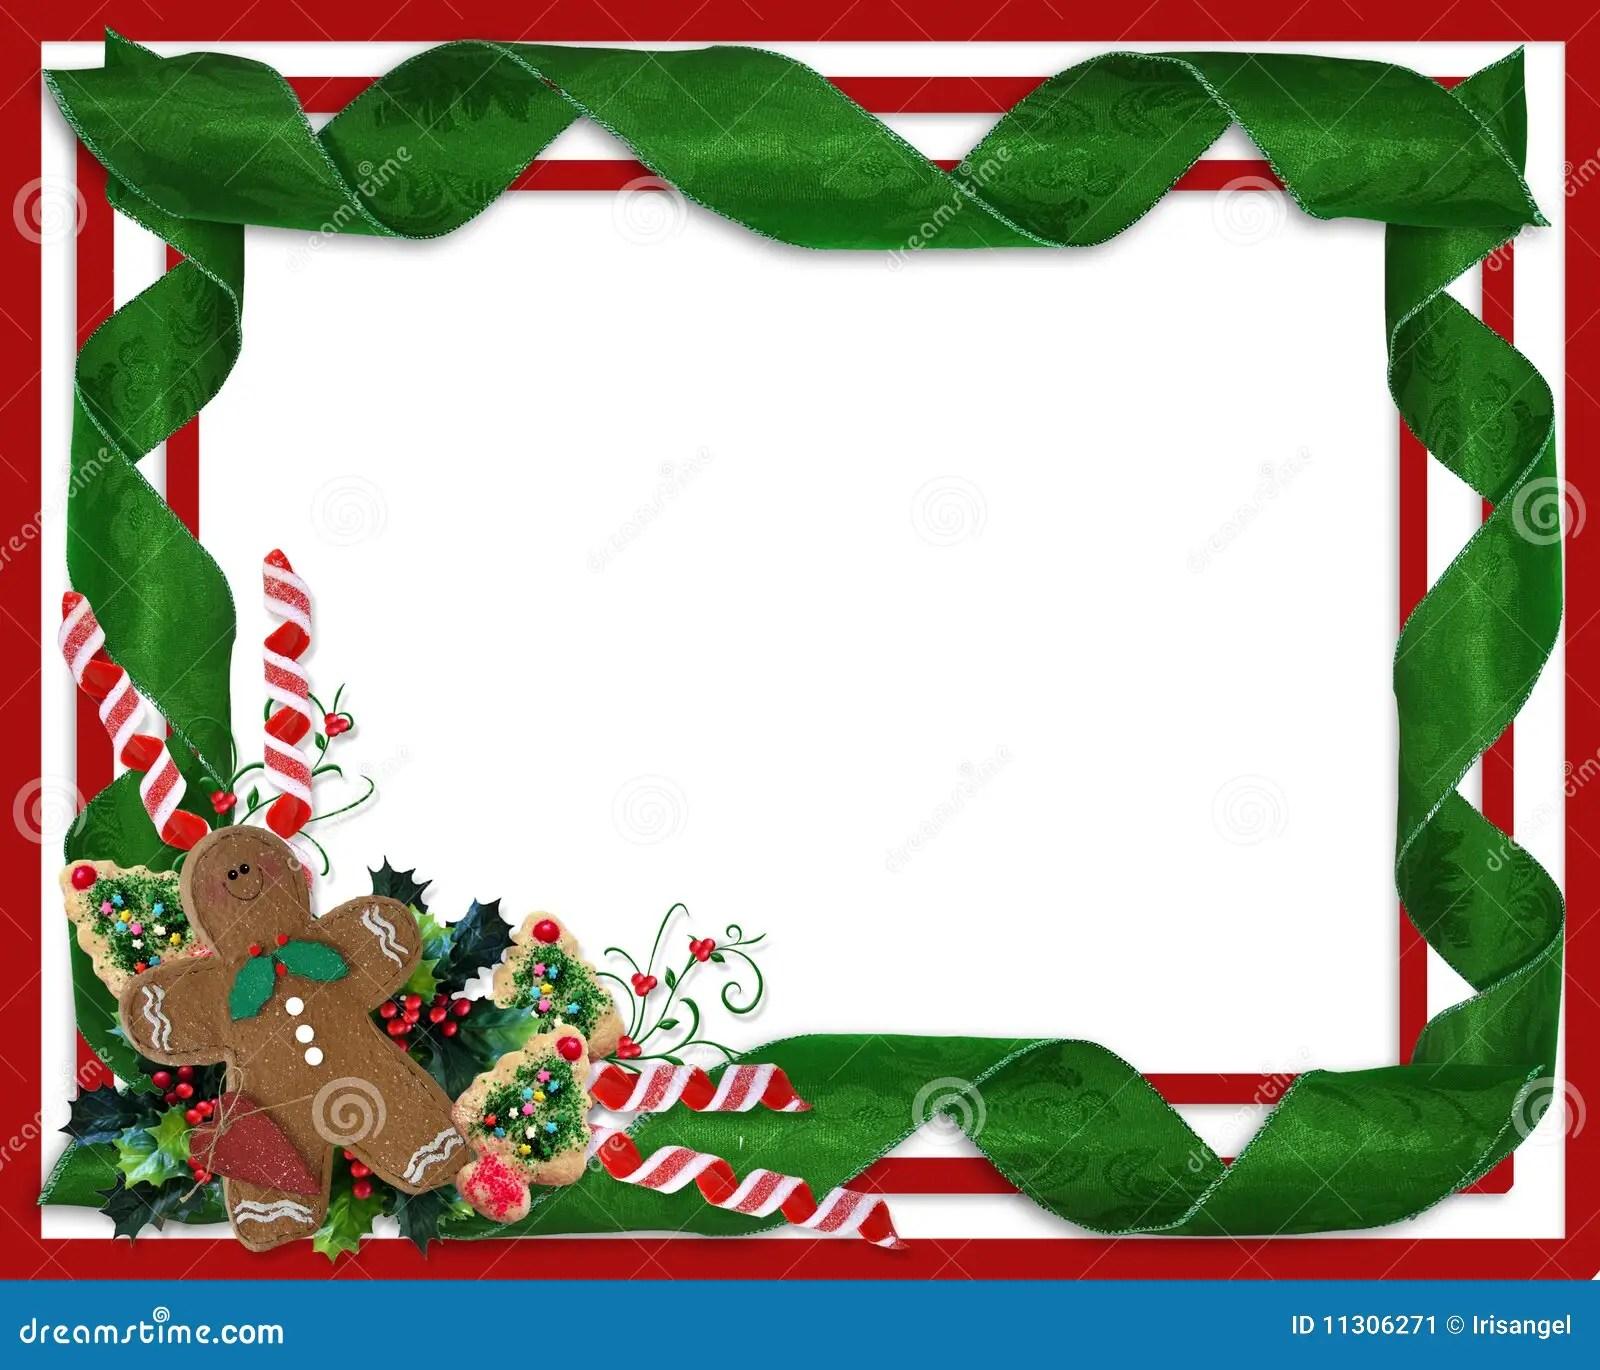 Christmas Border Ribbons And Treats Stock Illustration